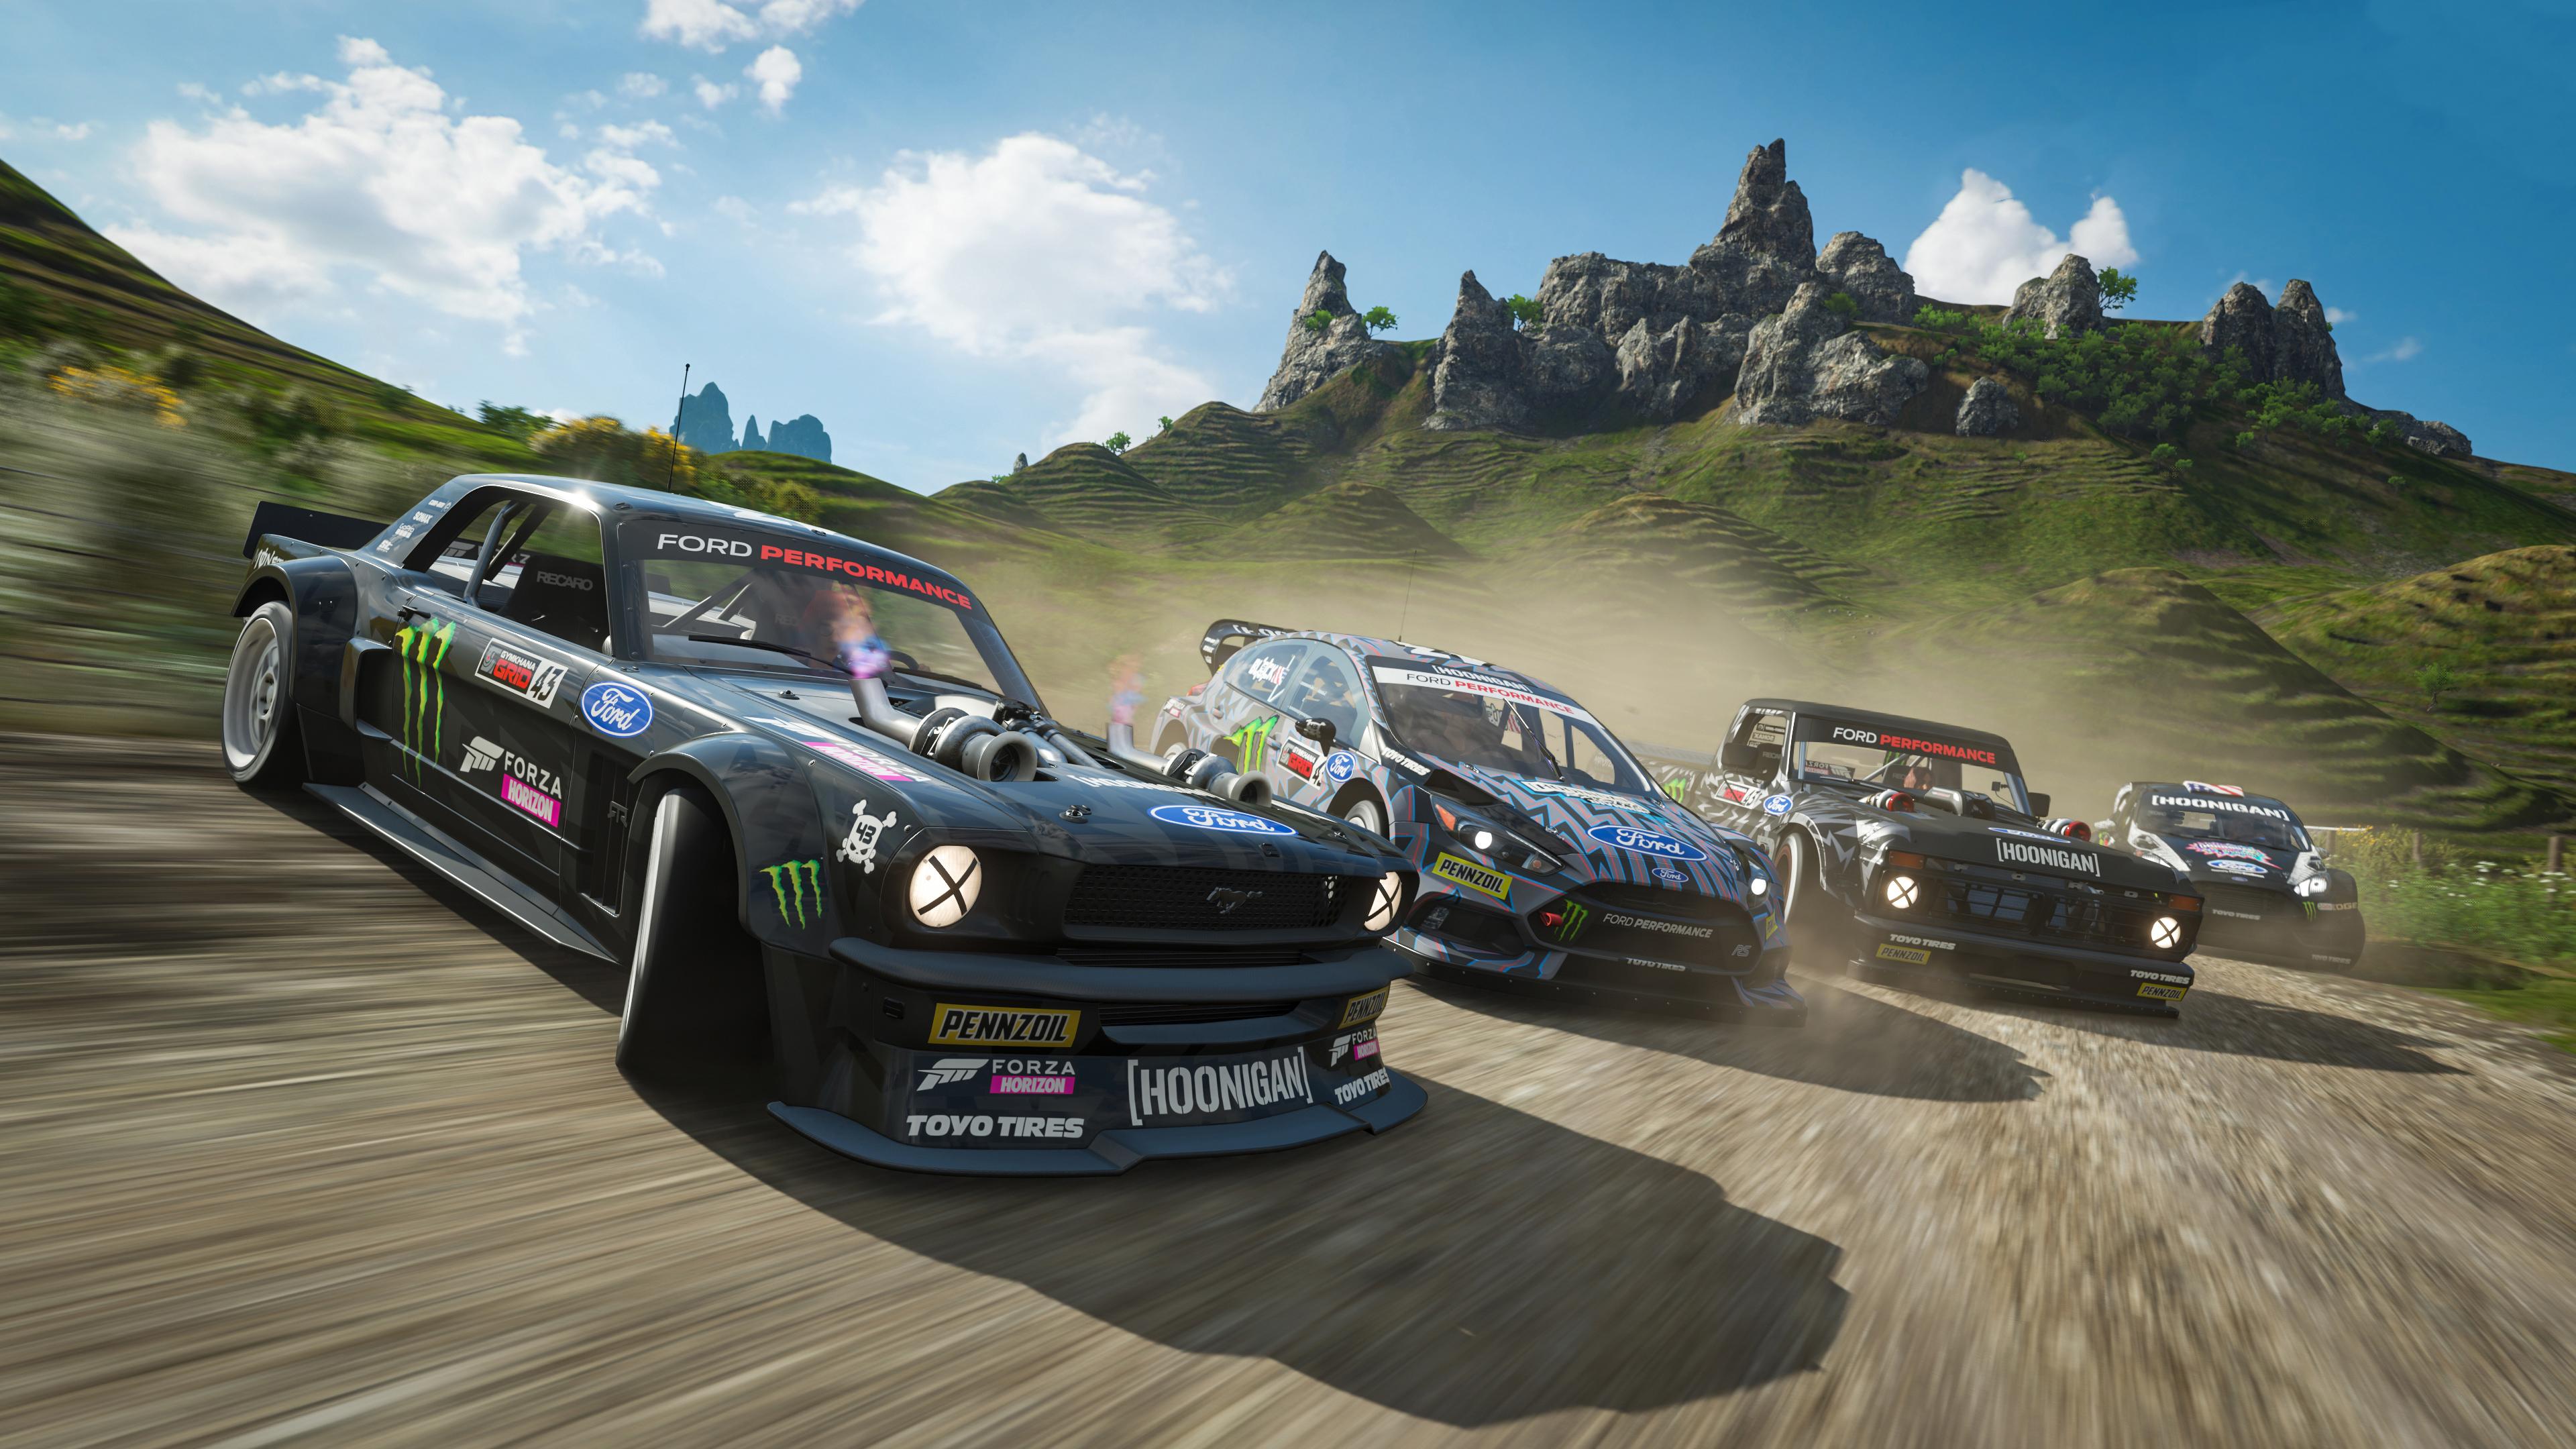 Fortune Island Forza Horizon 4 Wallpaper Hd Games 4k